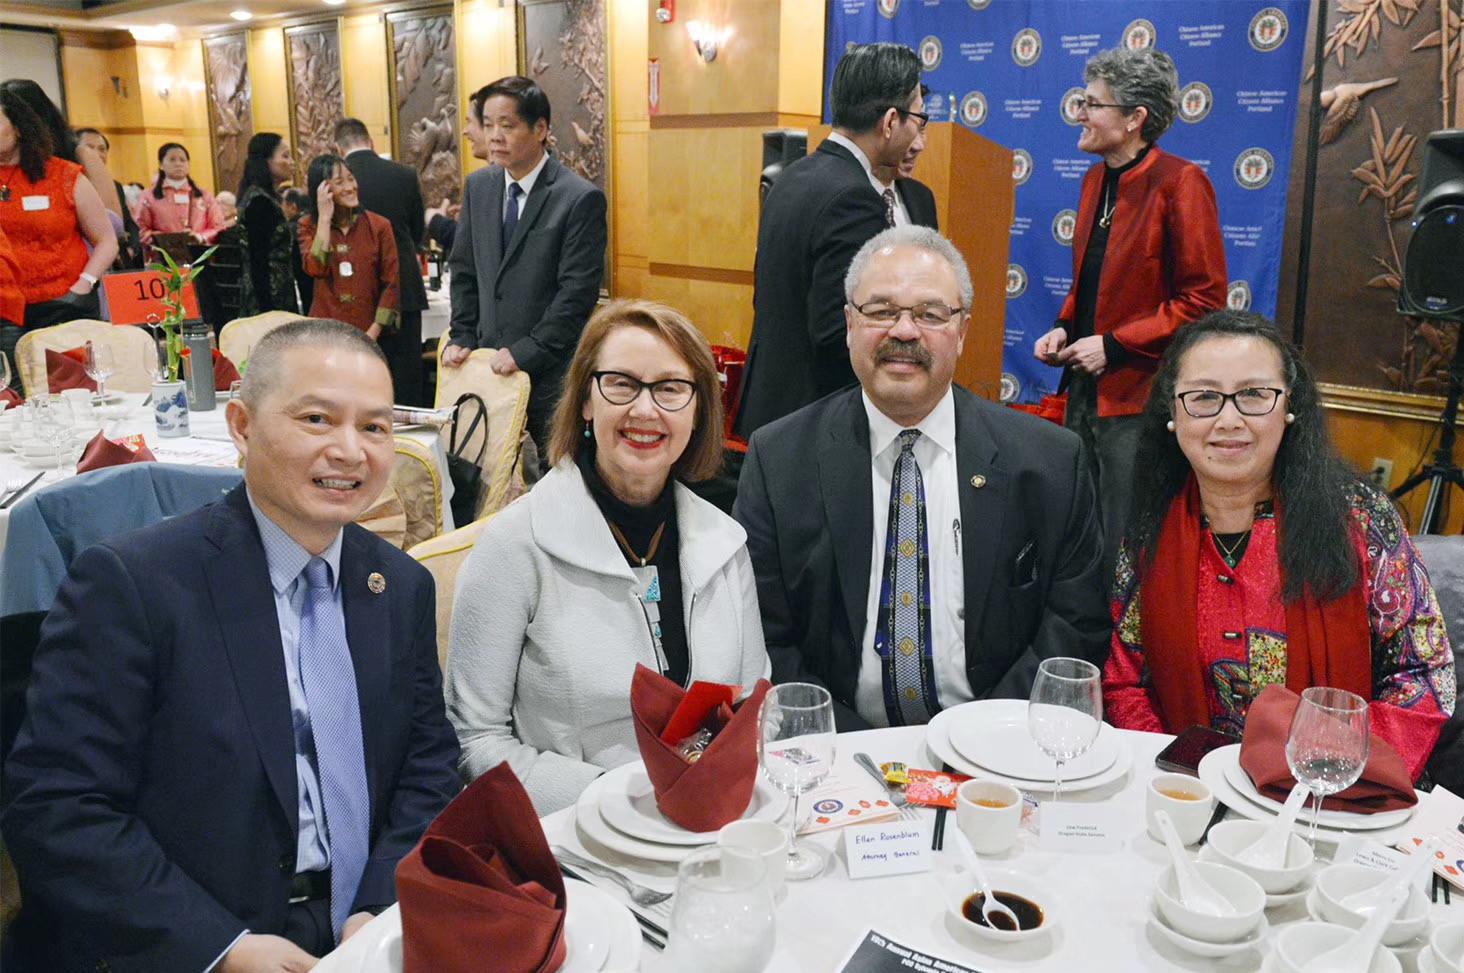 Jin Lan, State Attorney General Ellen Rosenblum, State Senator Lew Frederick and Meiru Liu